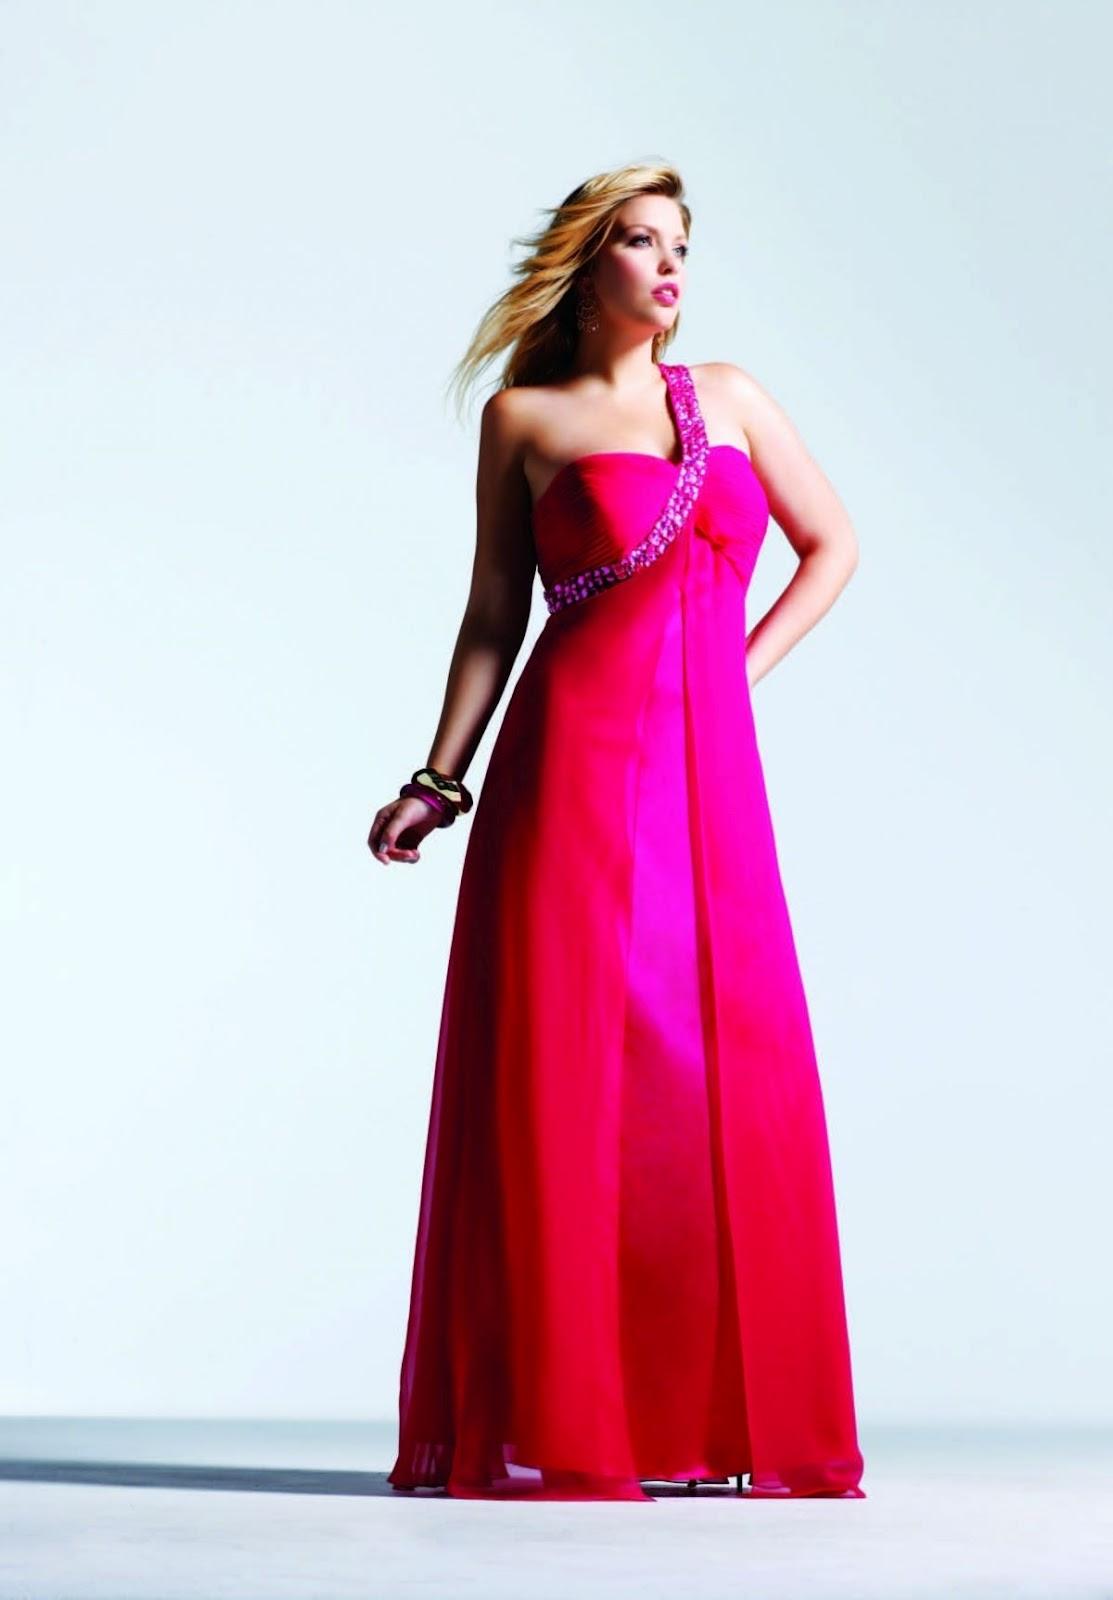 whiteazalea prom dresses cheap plus size prom dresses in. Black Bedroom Furniture Sets. Home Design Ideas